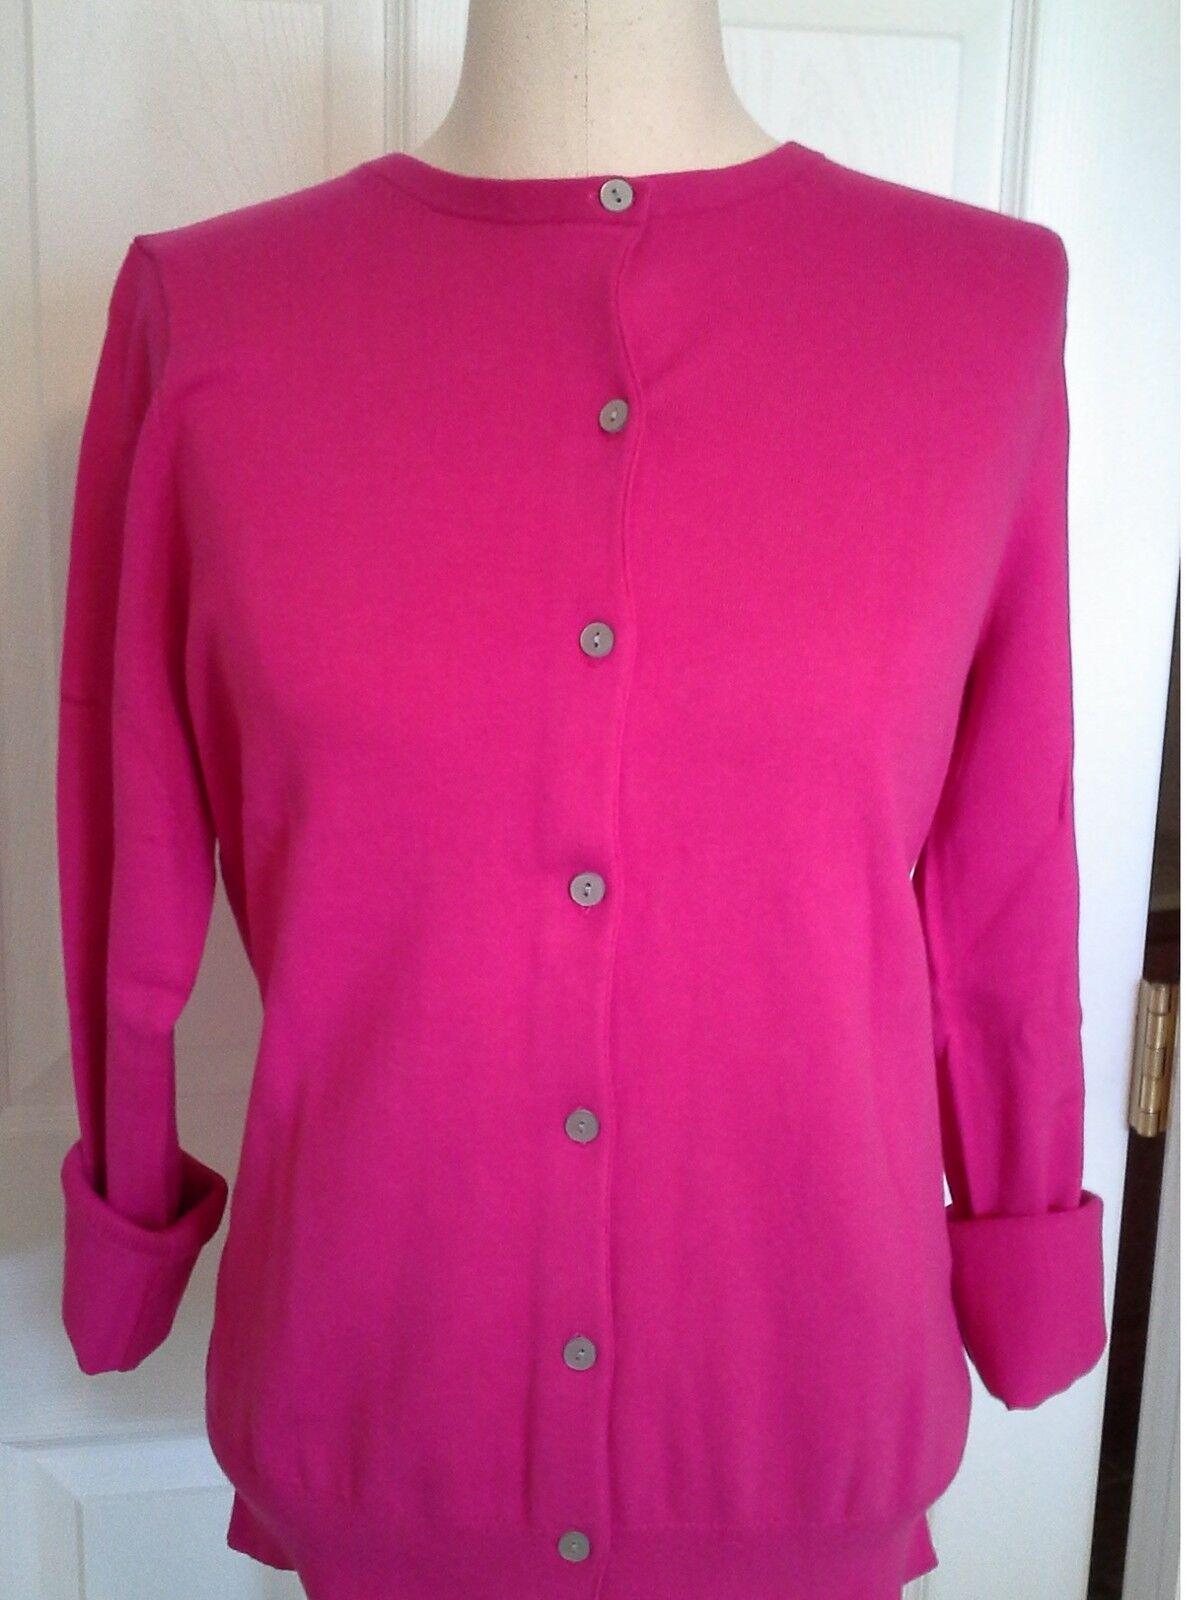 Lands End  Women's LS Supima Crew Cardigan Sweater Brilliant Fuchsia New